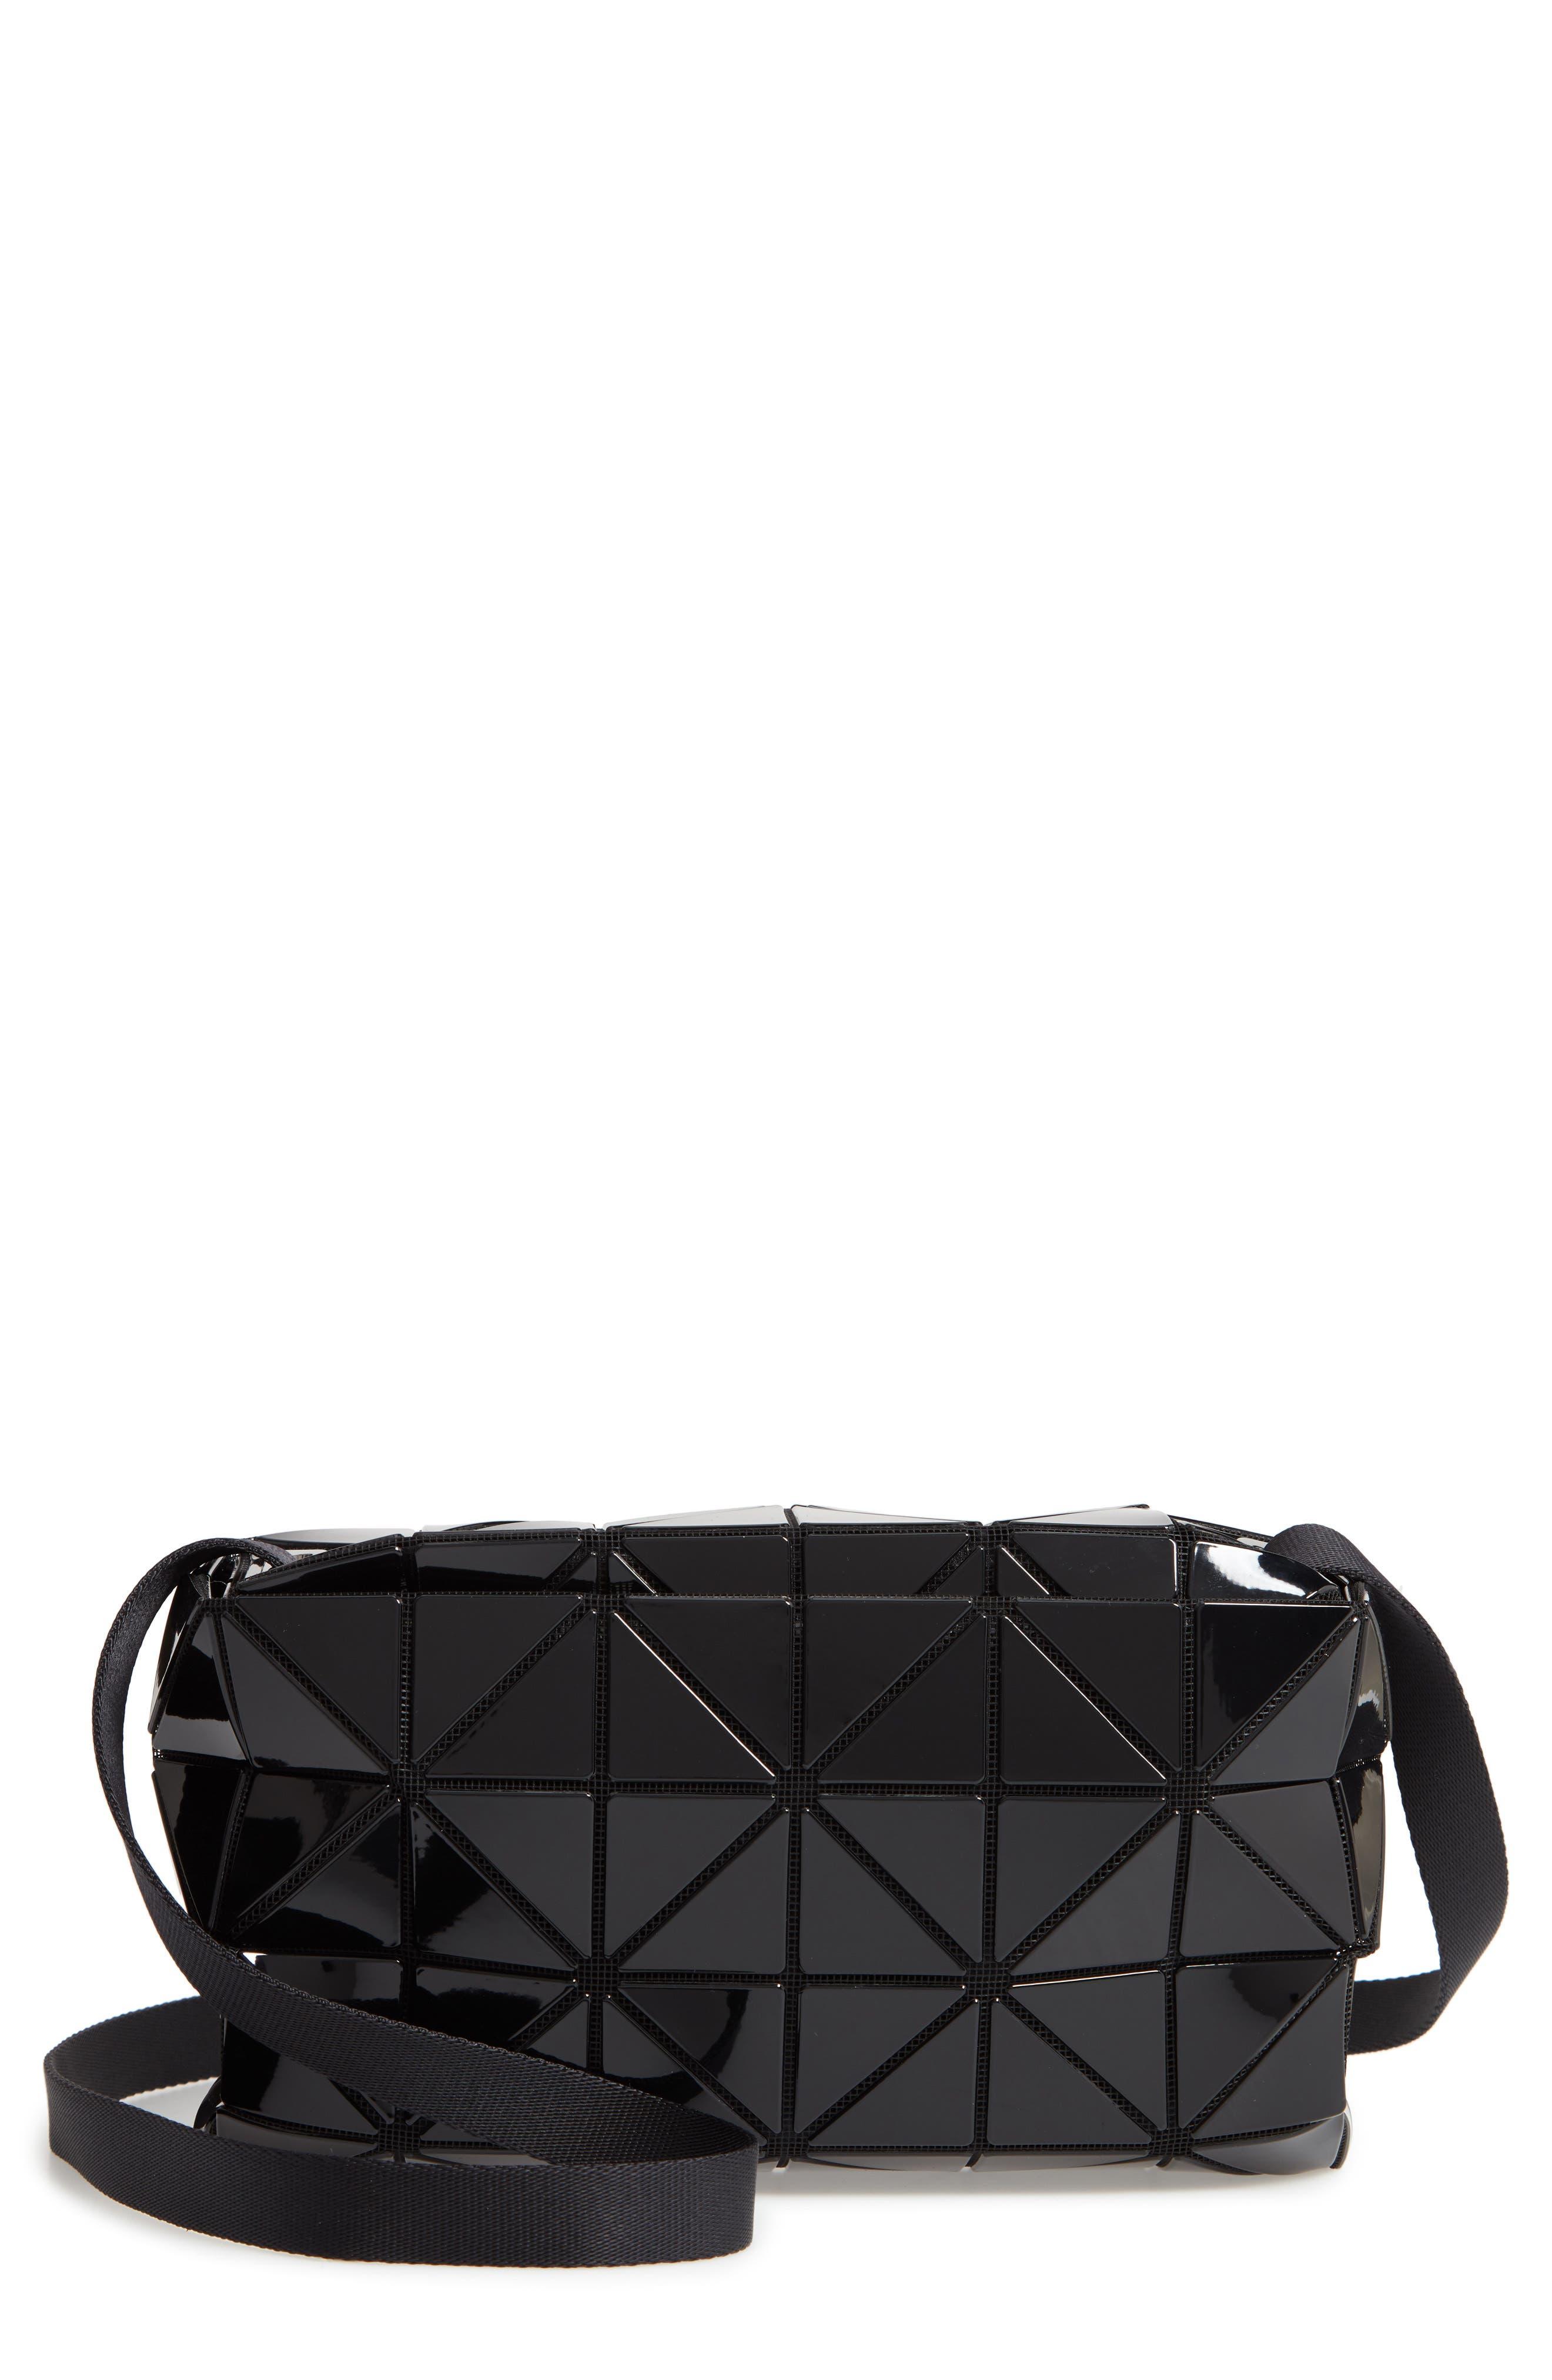 Carton Crossbody Bag,                         Main,                         color, BLACK